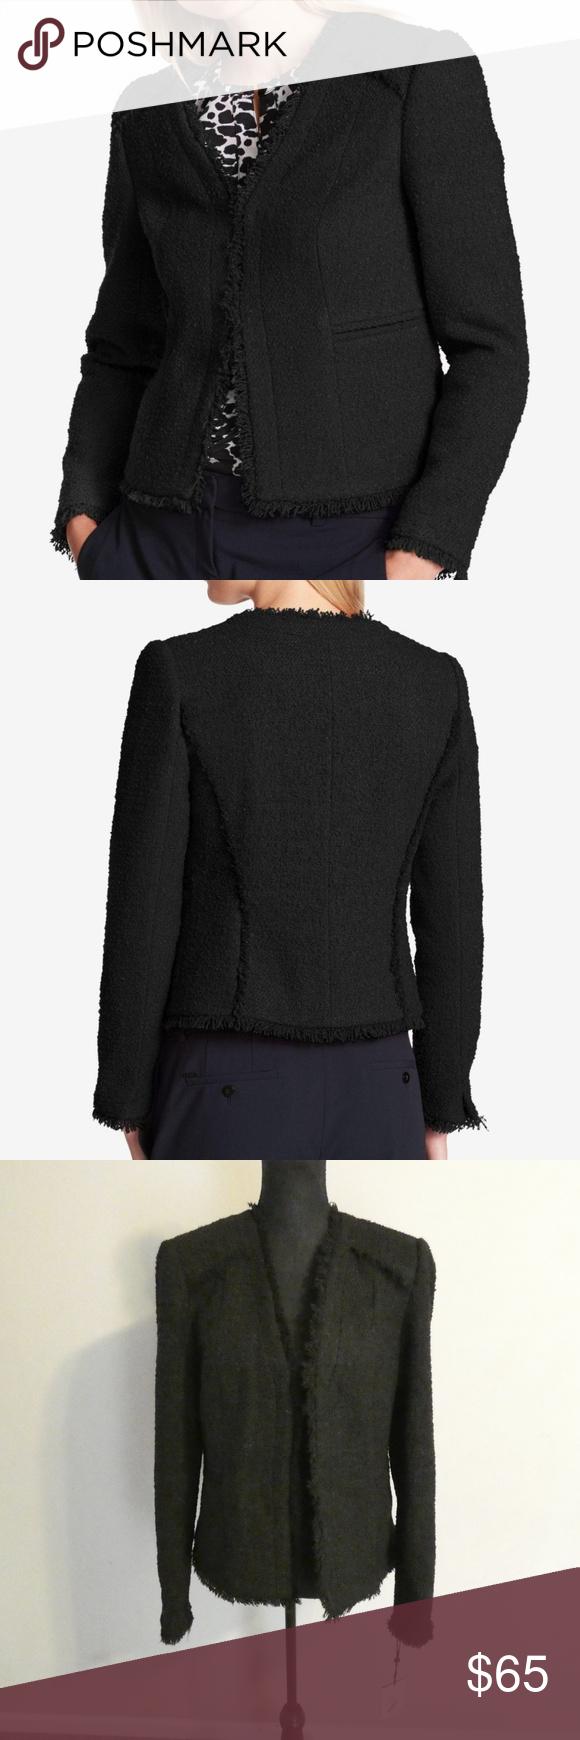 DKNY Fringe-Trim Textured Blazer